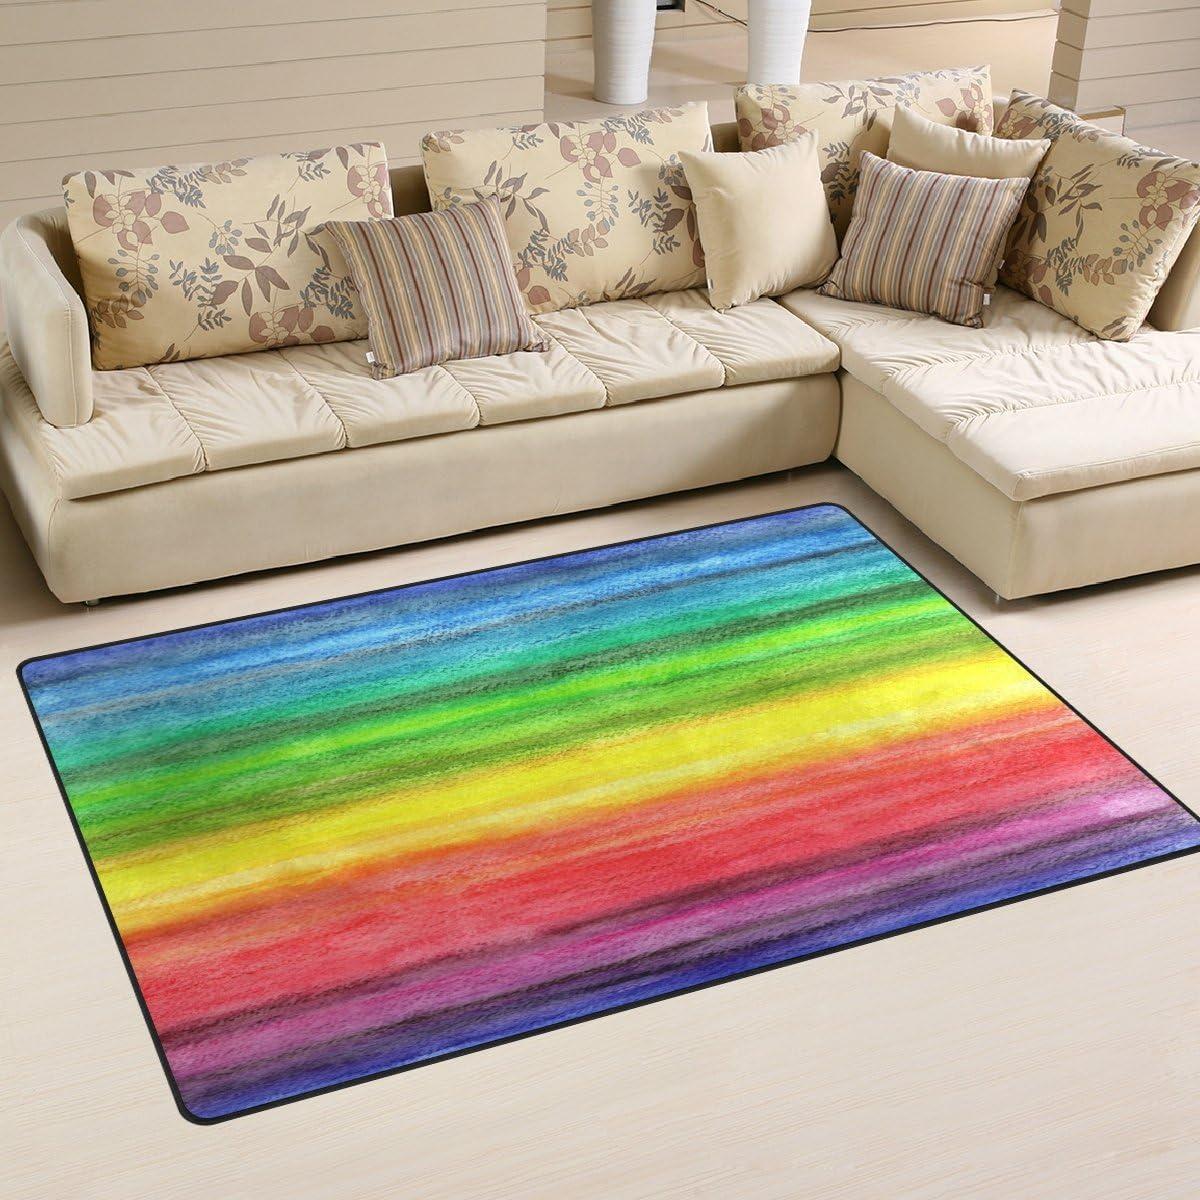 WOZO Watercolor Rainbow Color Area Rug Rugs Non-Slip Floor Mat Doormats Living Dining Room Bedroom Dorm 60 x 39 inches inches Home Decor